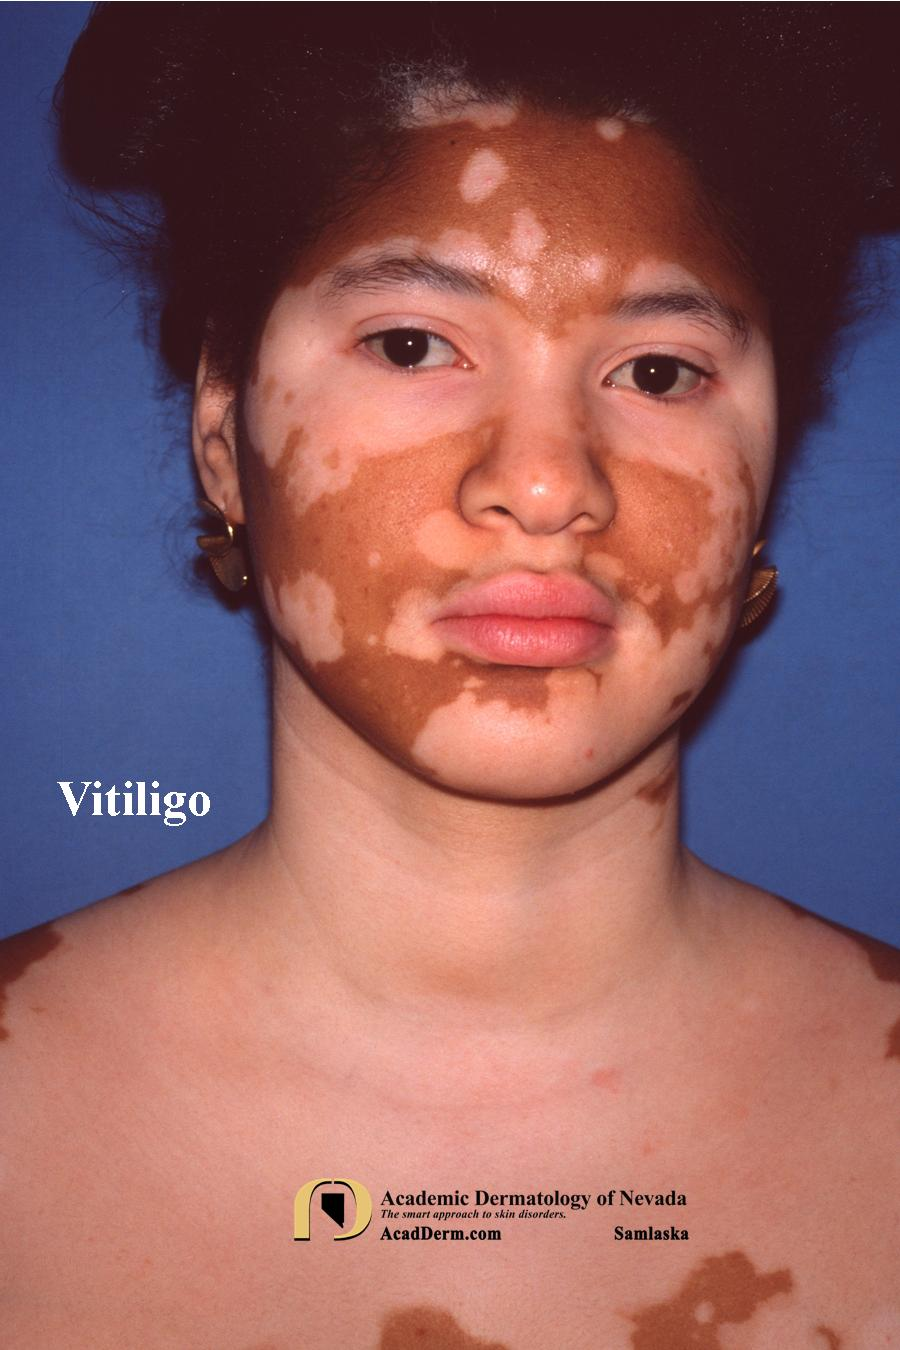 Vitiligo Leukoderma Sins Against The Sun Academic Dermatology Of Nevada